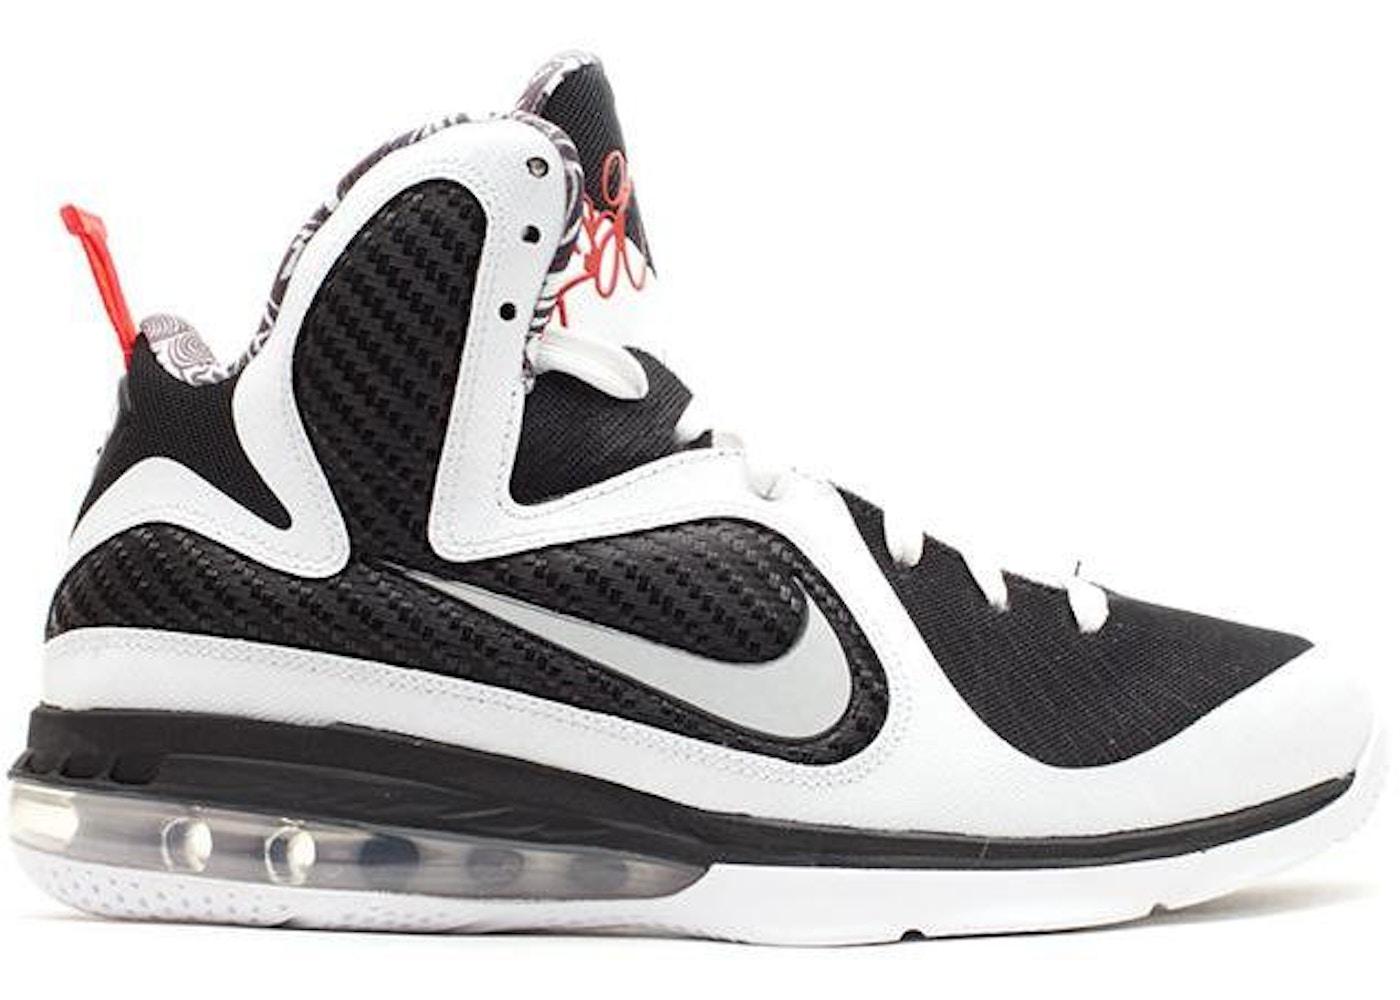 c68b5b59646 Nike LeBron 9 Shoes - Average Sale Price